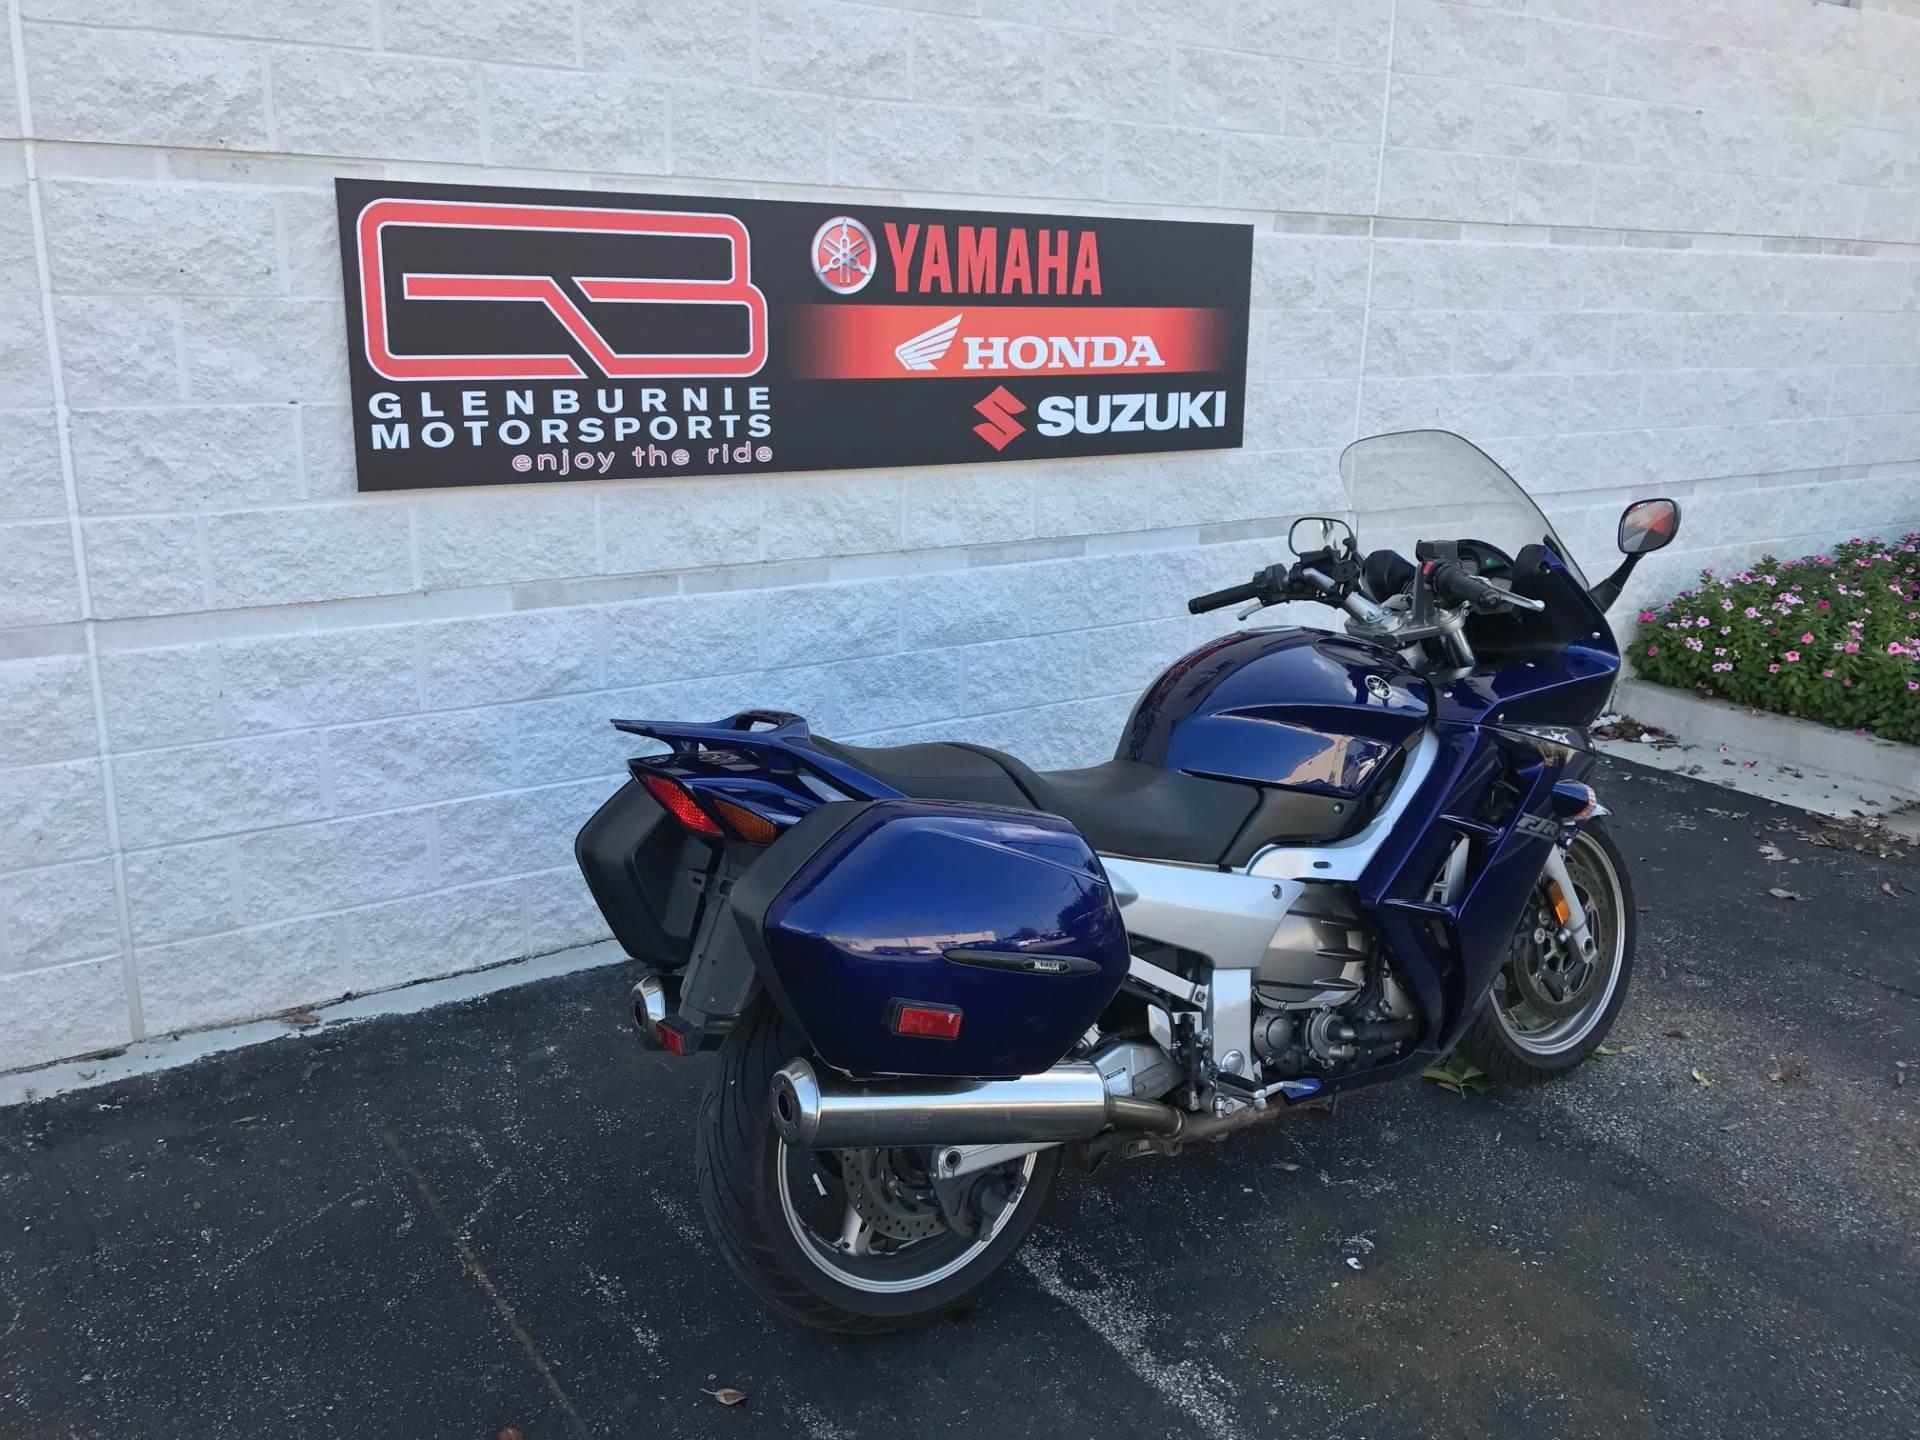 2005 Yamaha FJR1300 ABS in Glen Burnie, Maryland